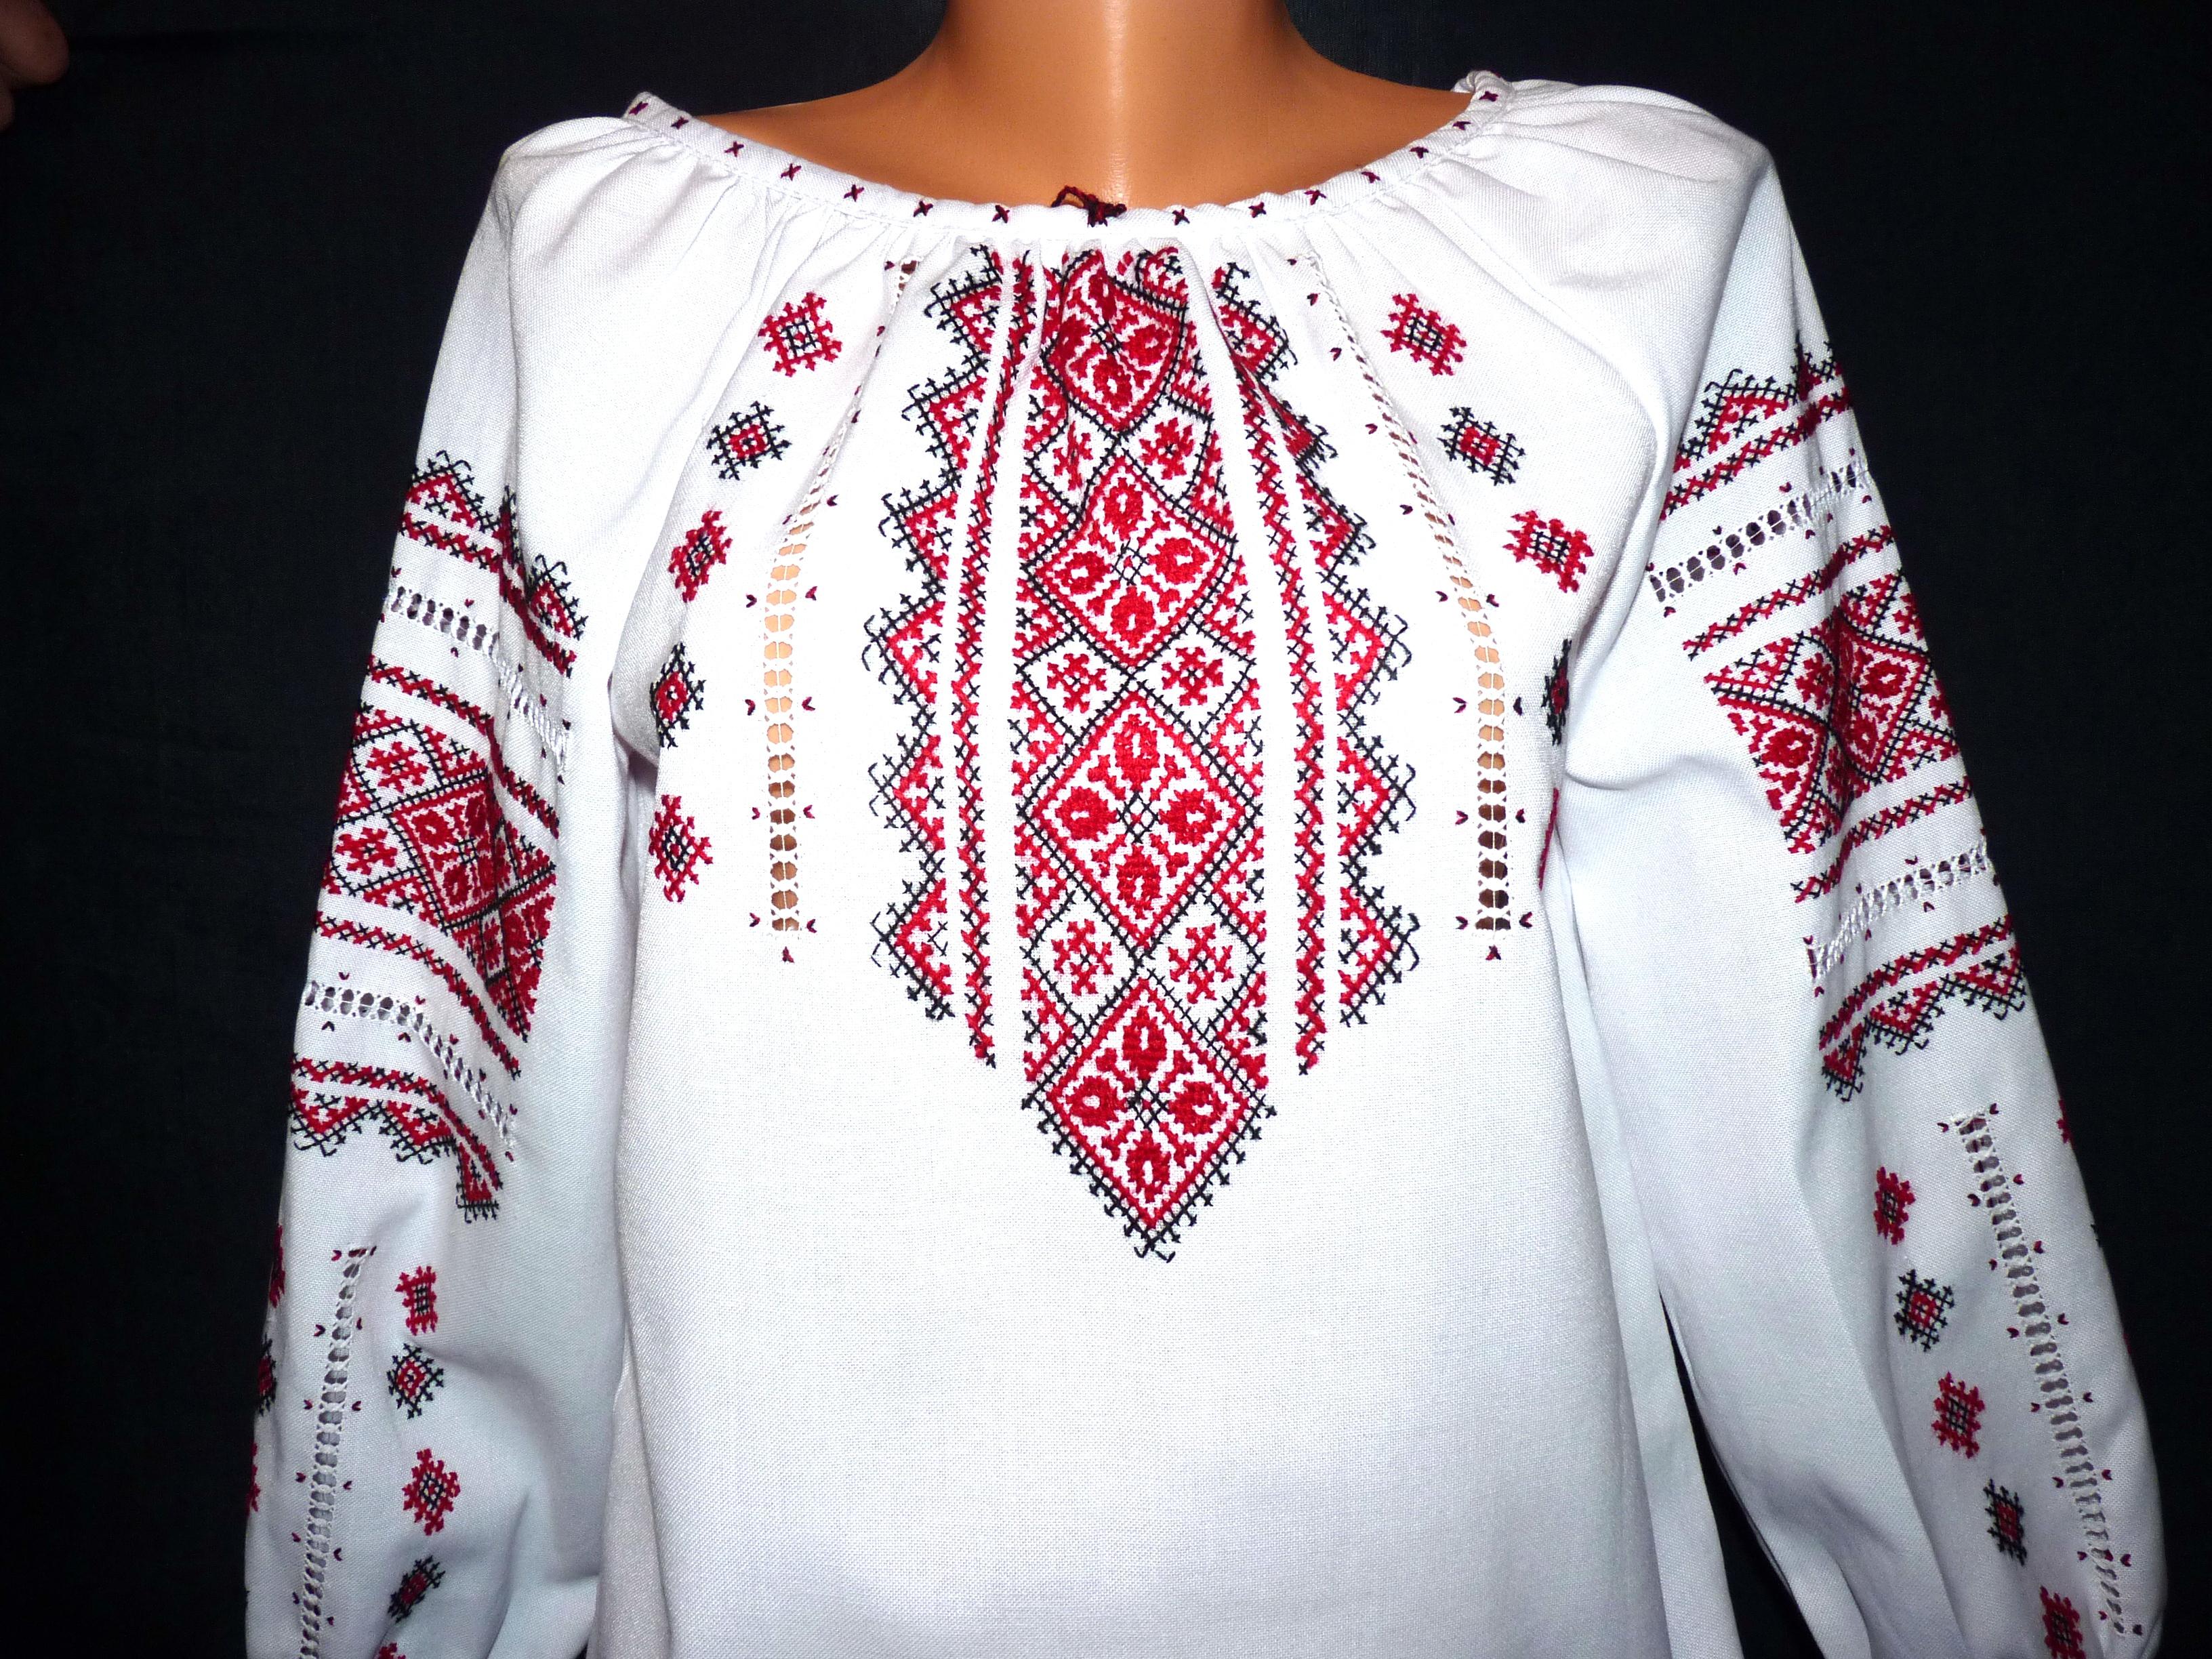 красивая вышиванка для девочки - Товары - Вишиванки ручної роботи ... b346920bcba88